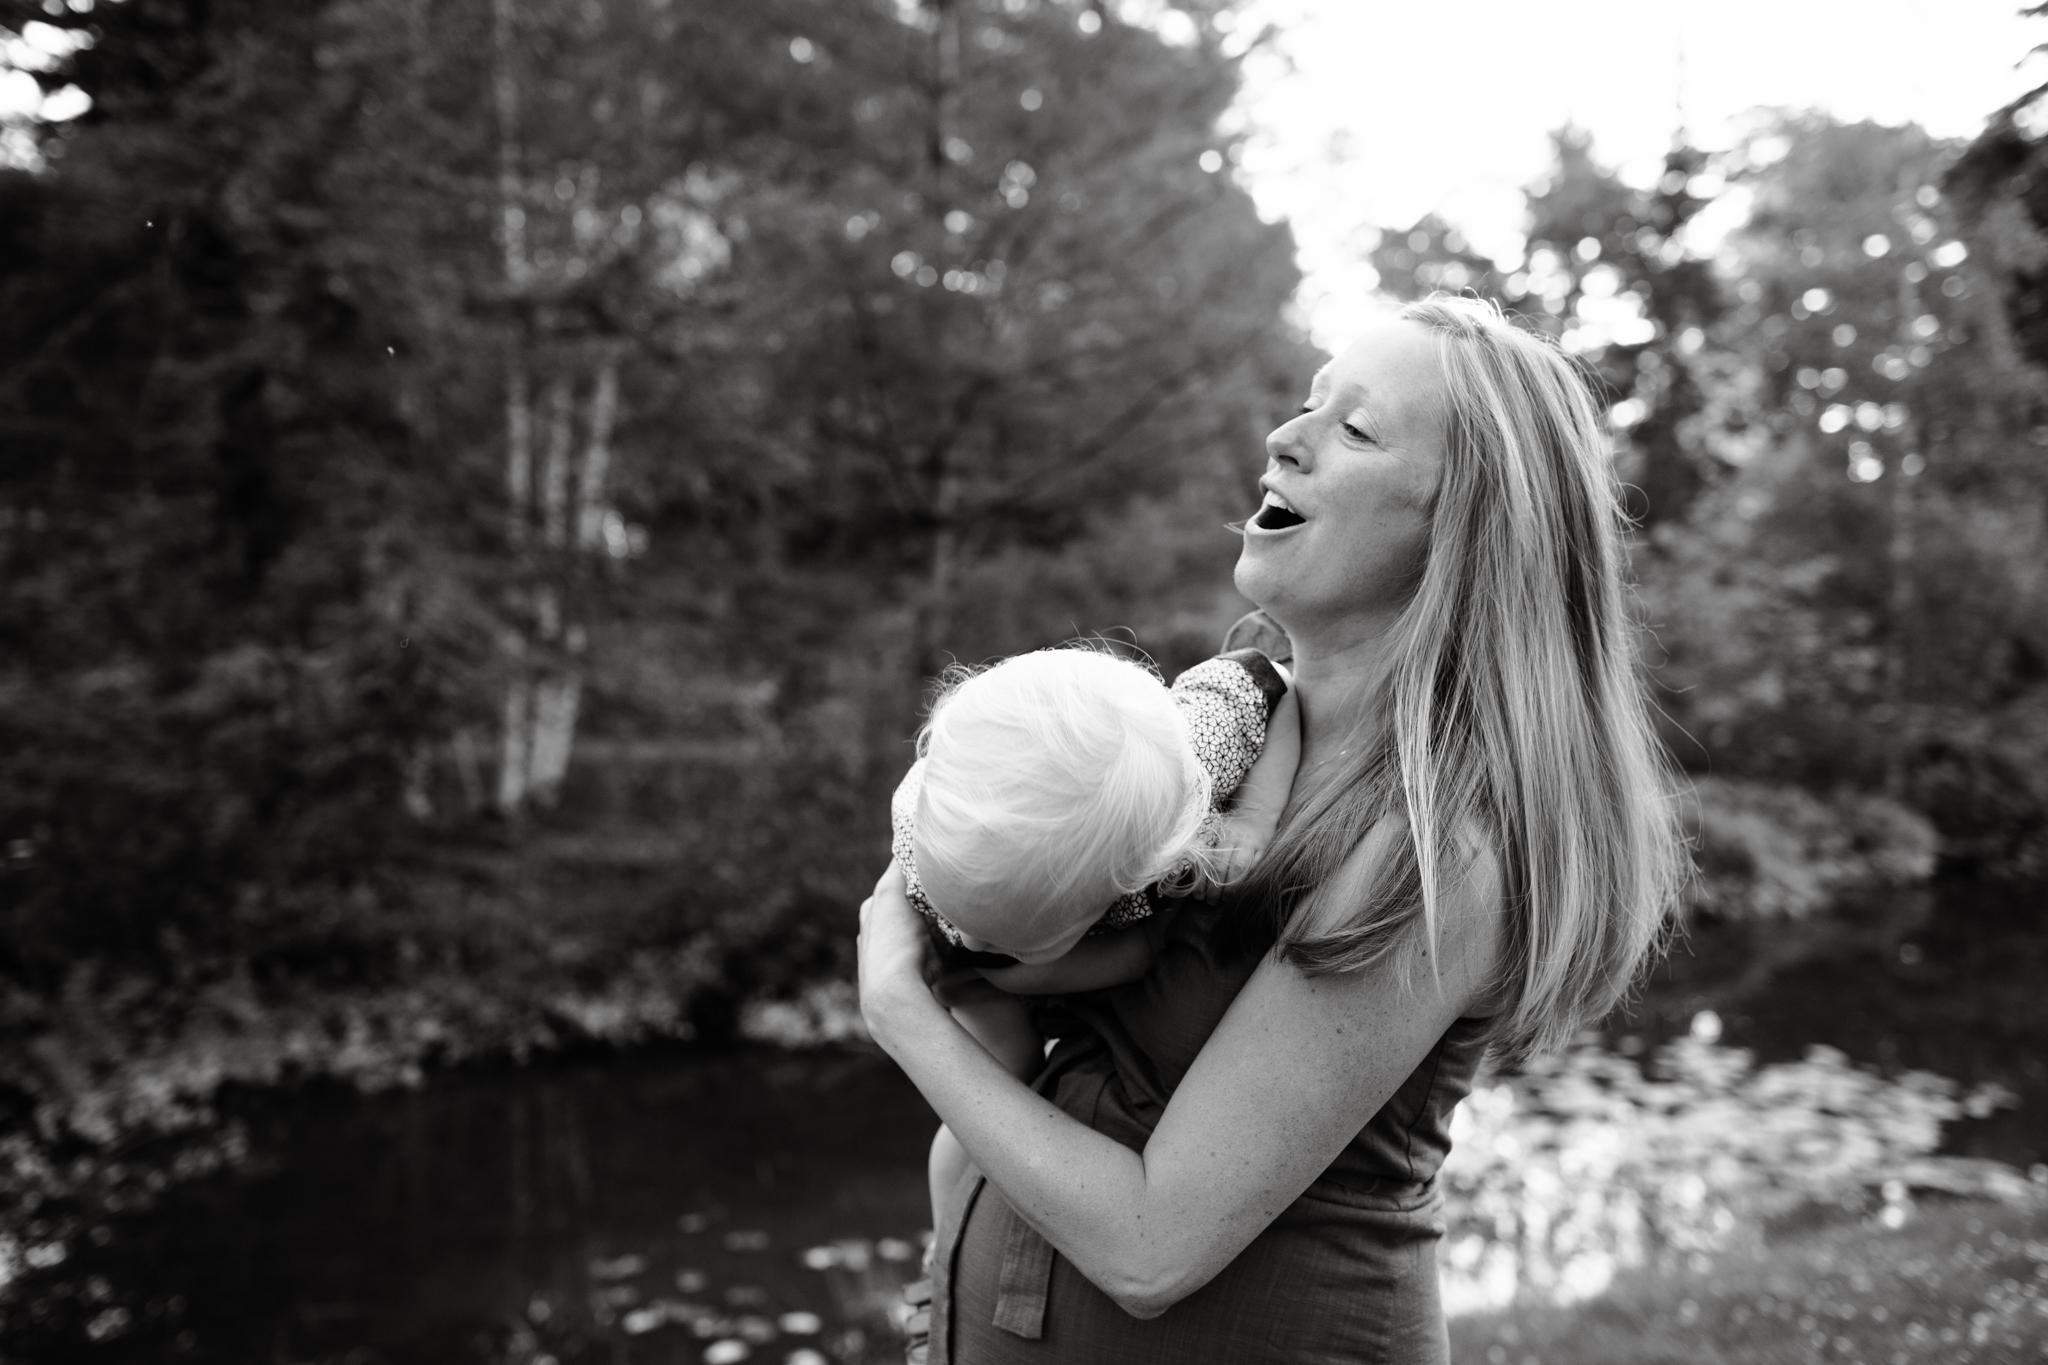 maine-maternity-photographer-stepheneycollins -59.jpg